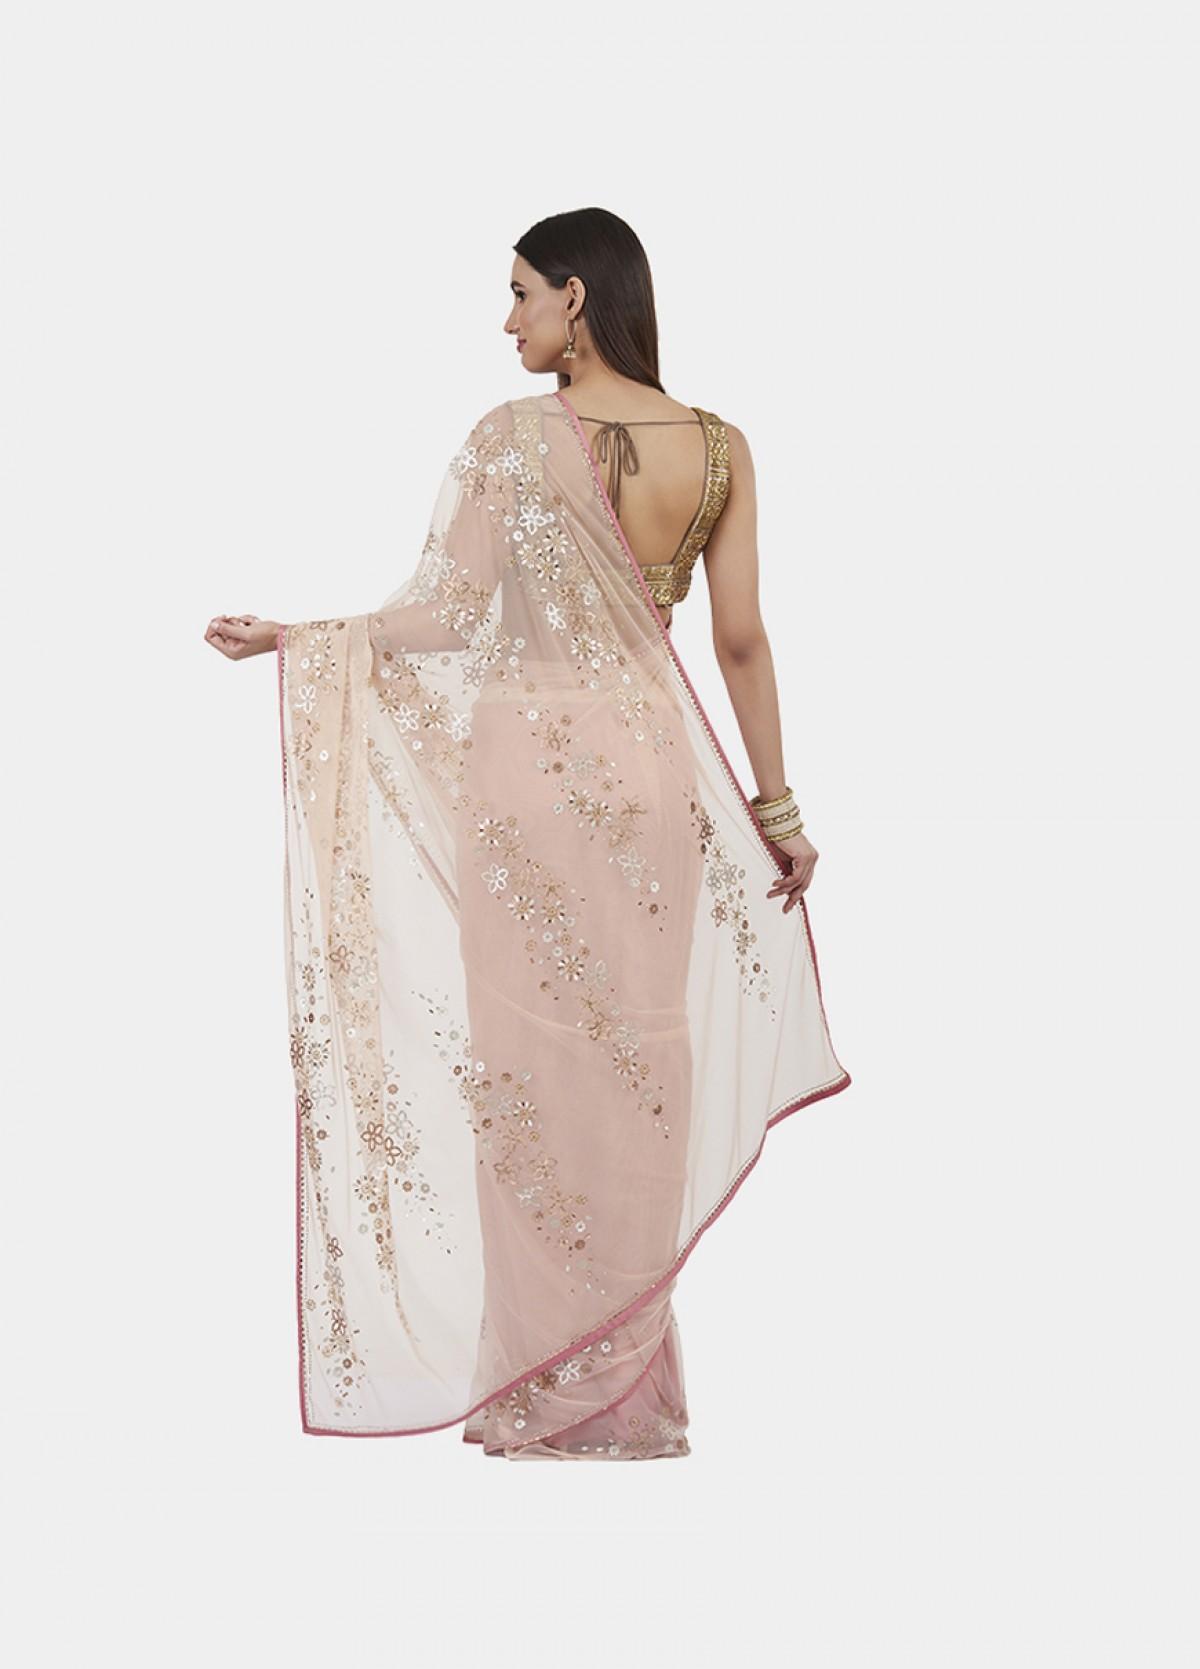 The Patti Sari